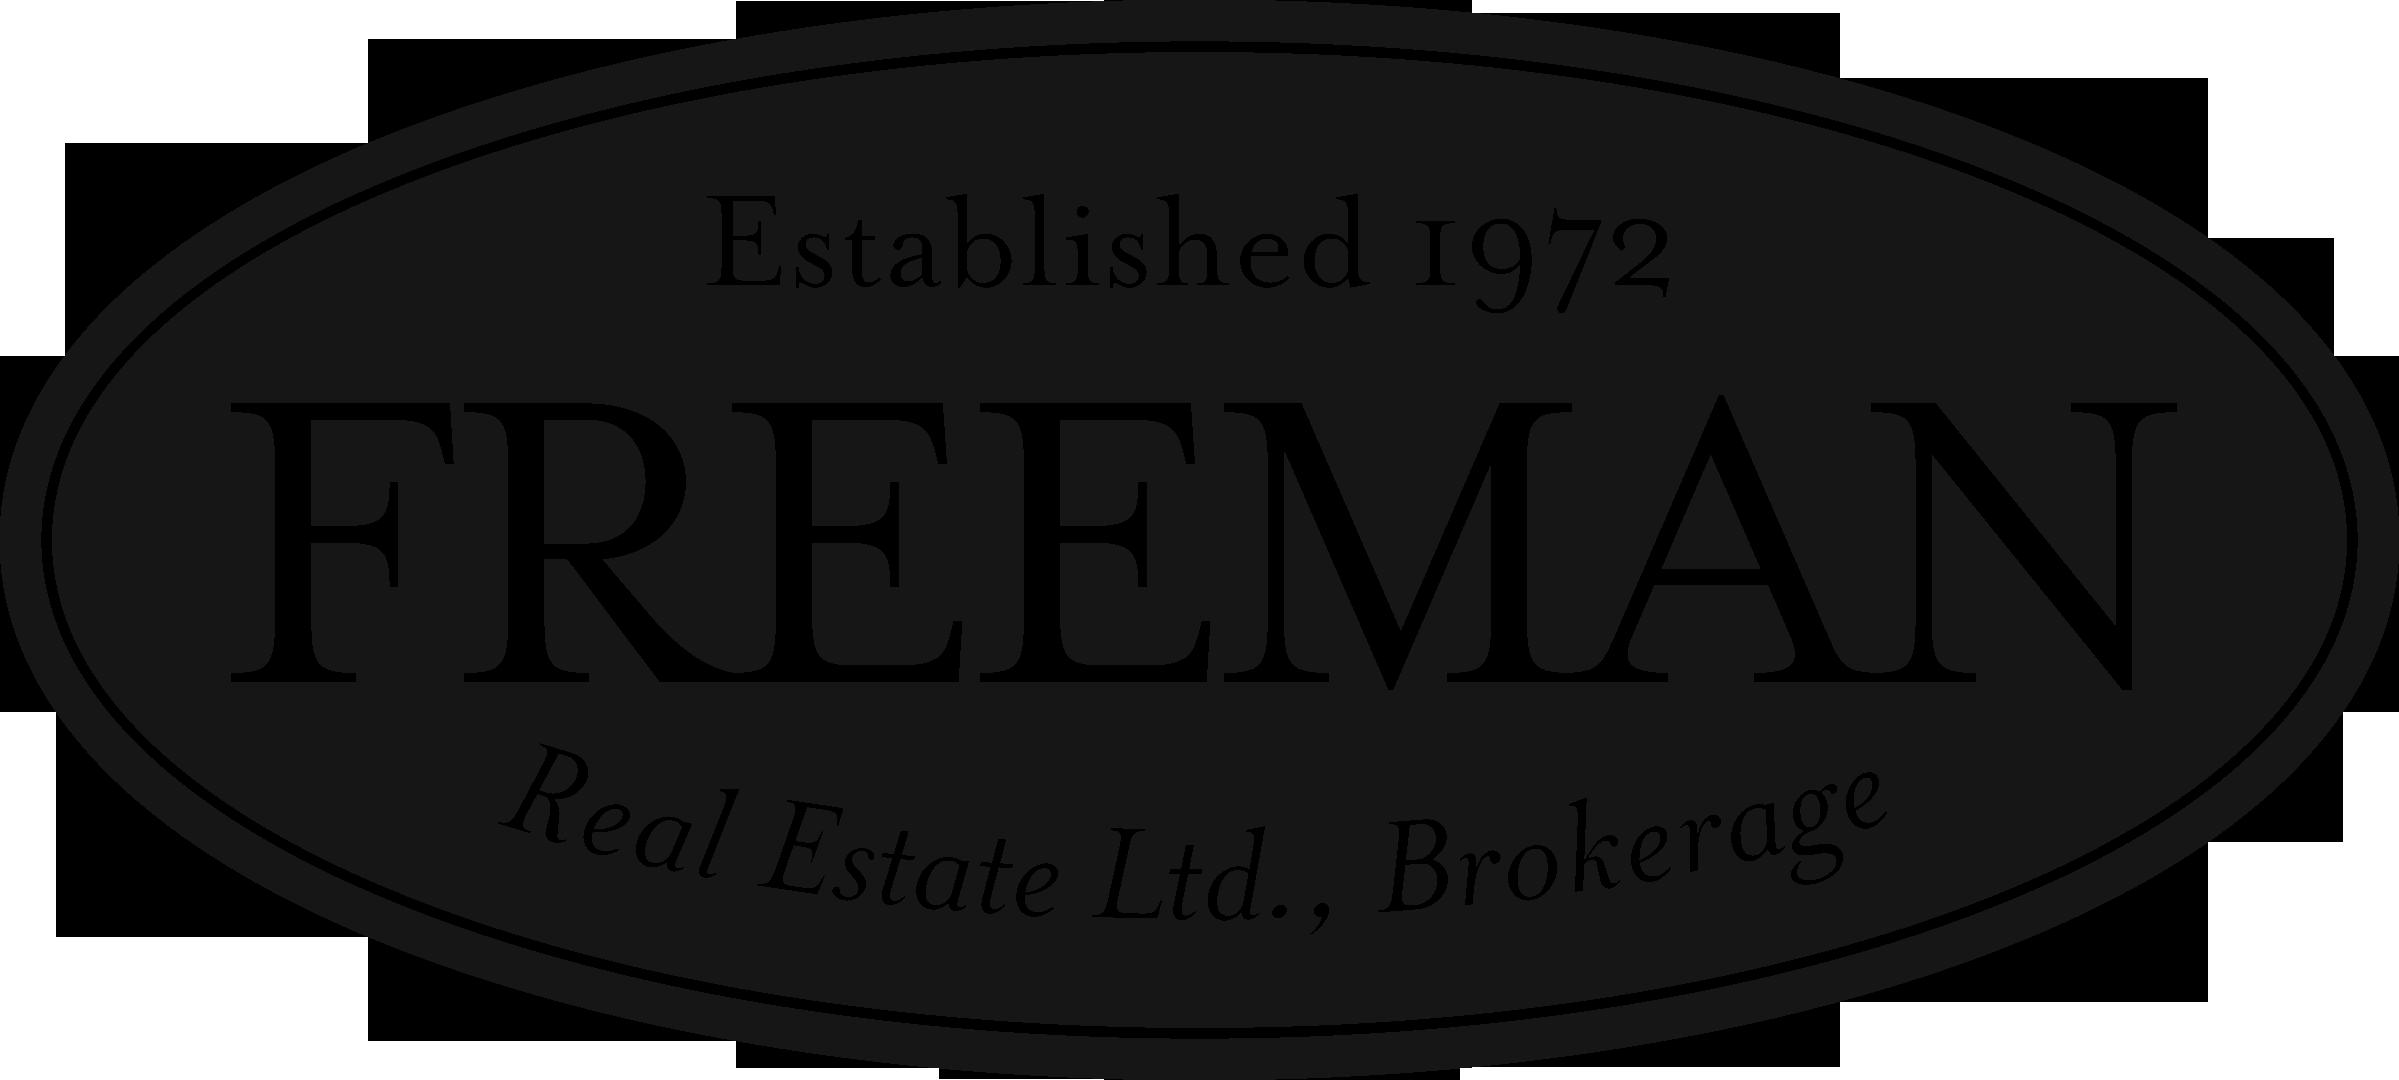 Freeman Real Estate Ltd